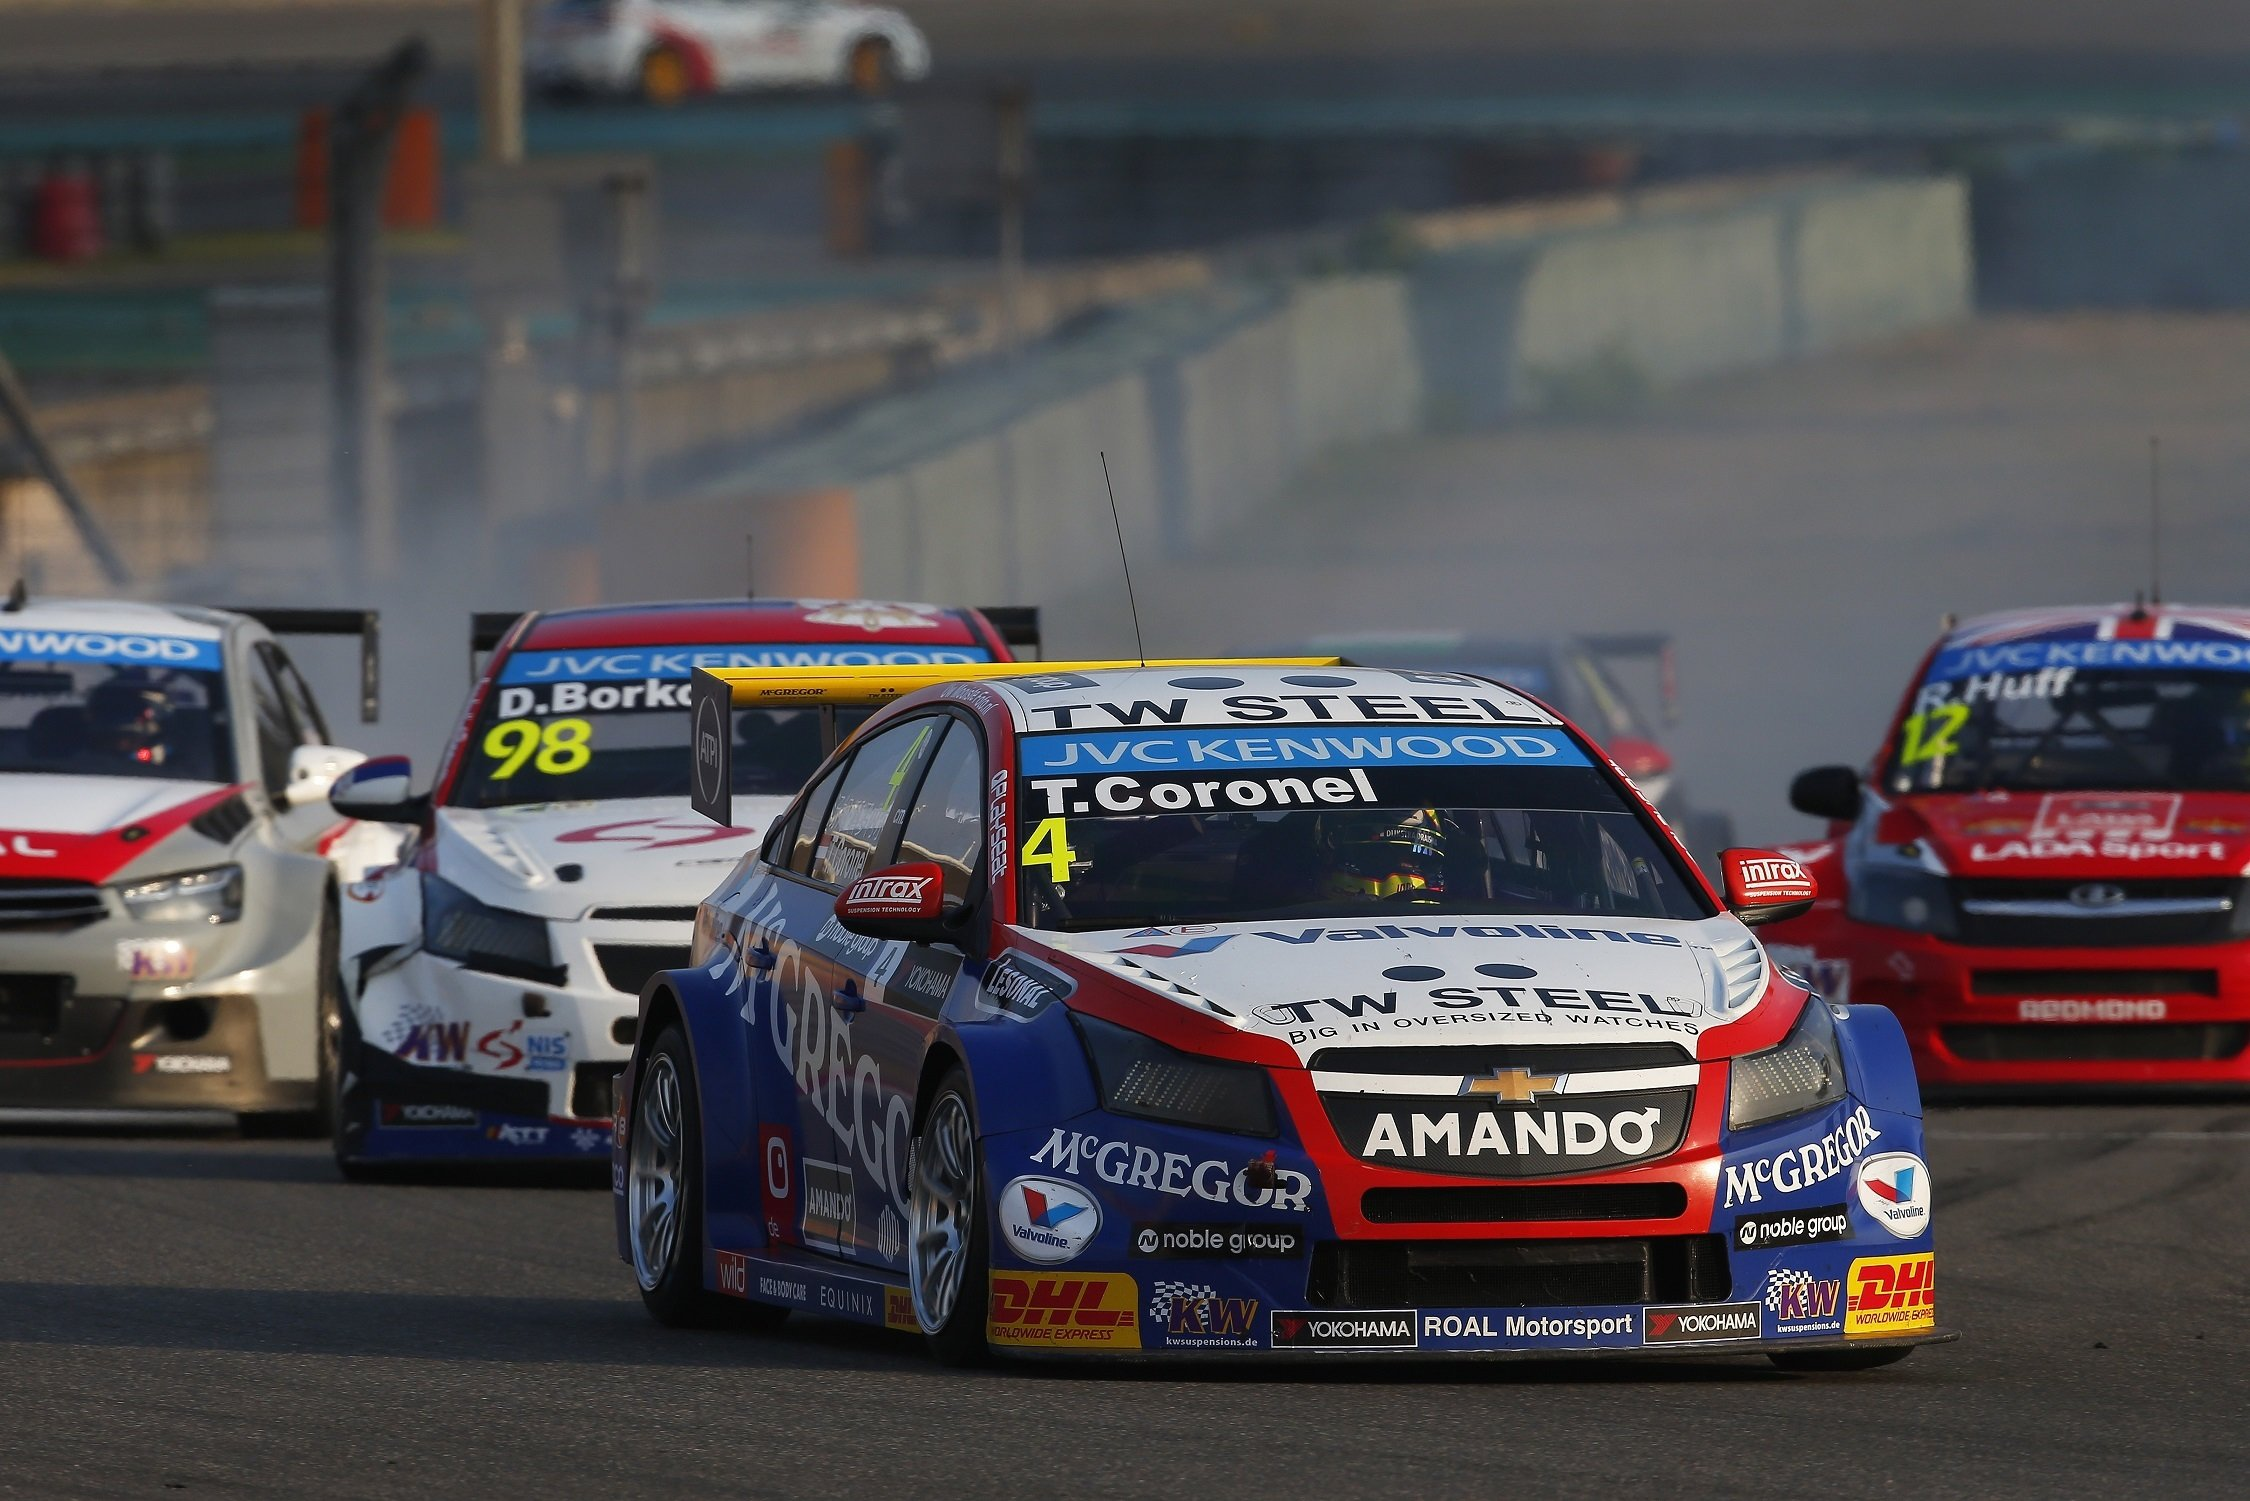 Best Grand Touring Car Top Gear